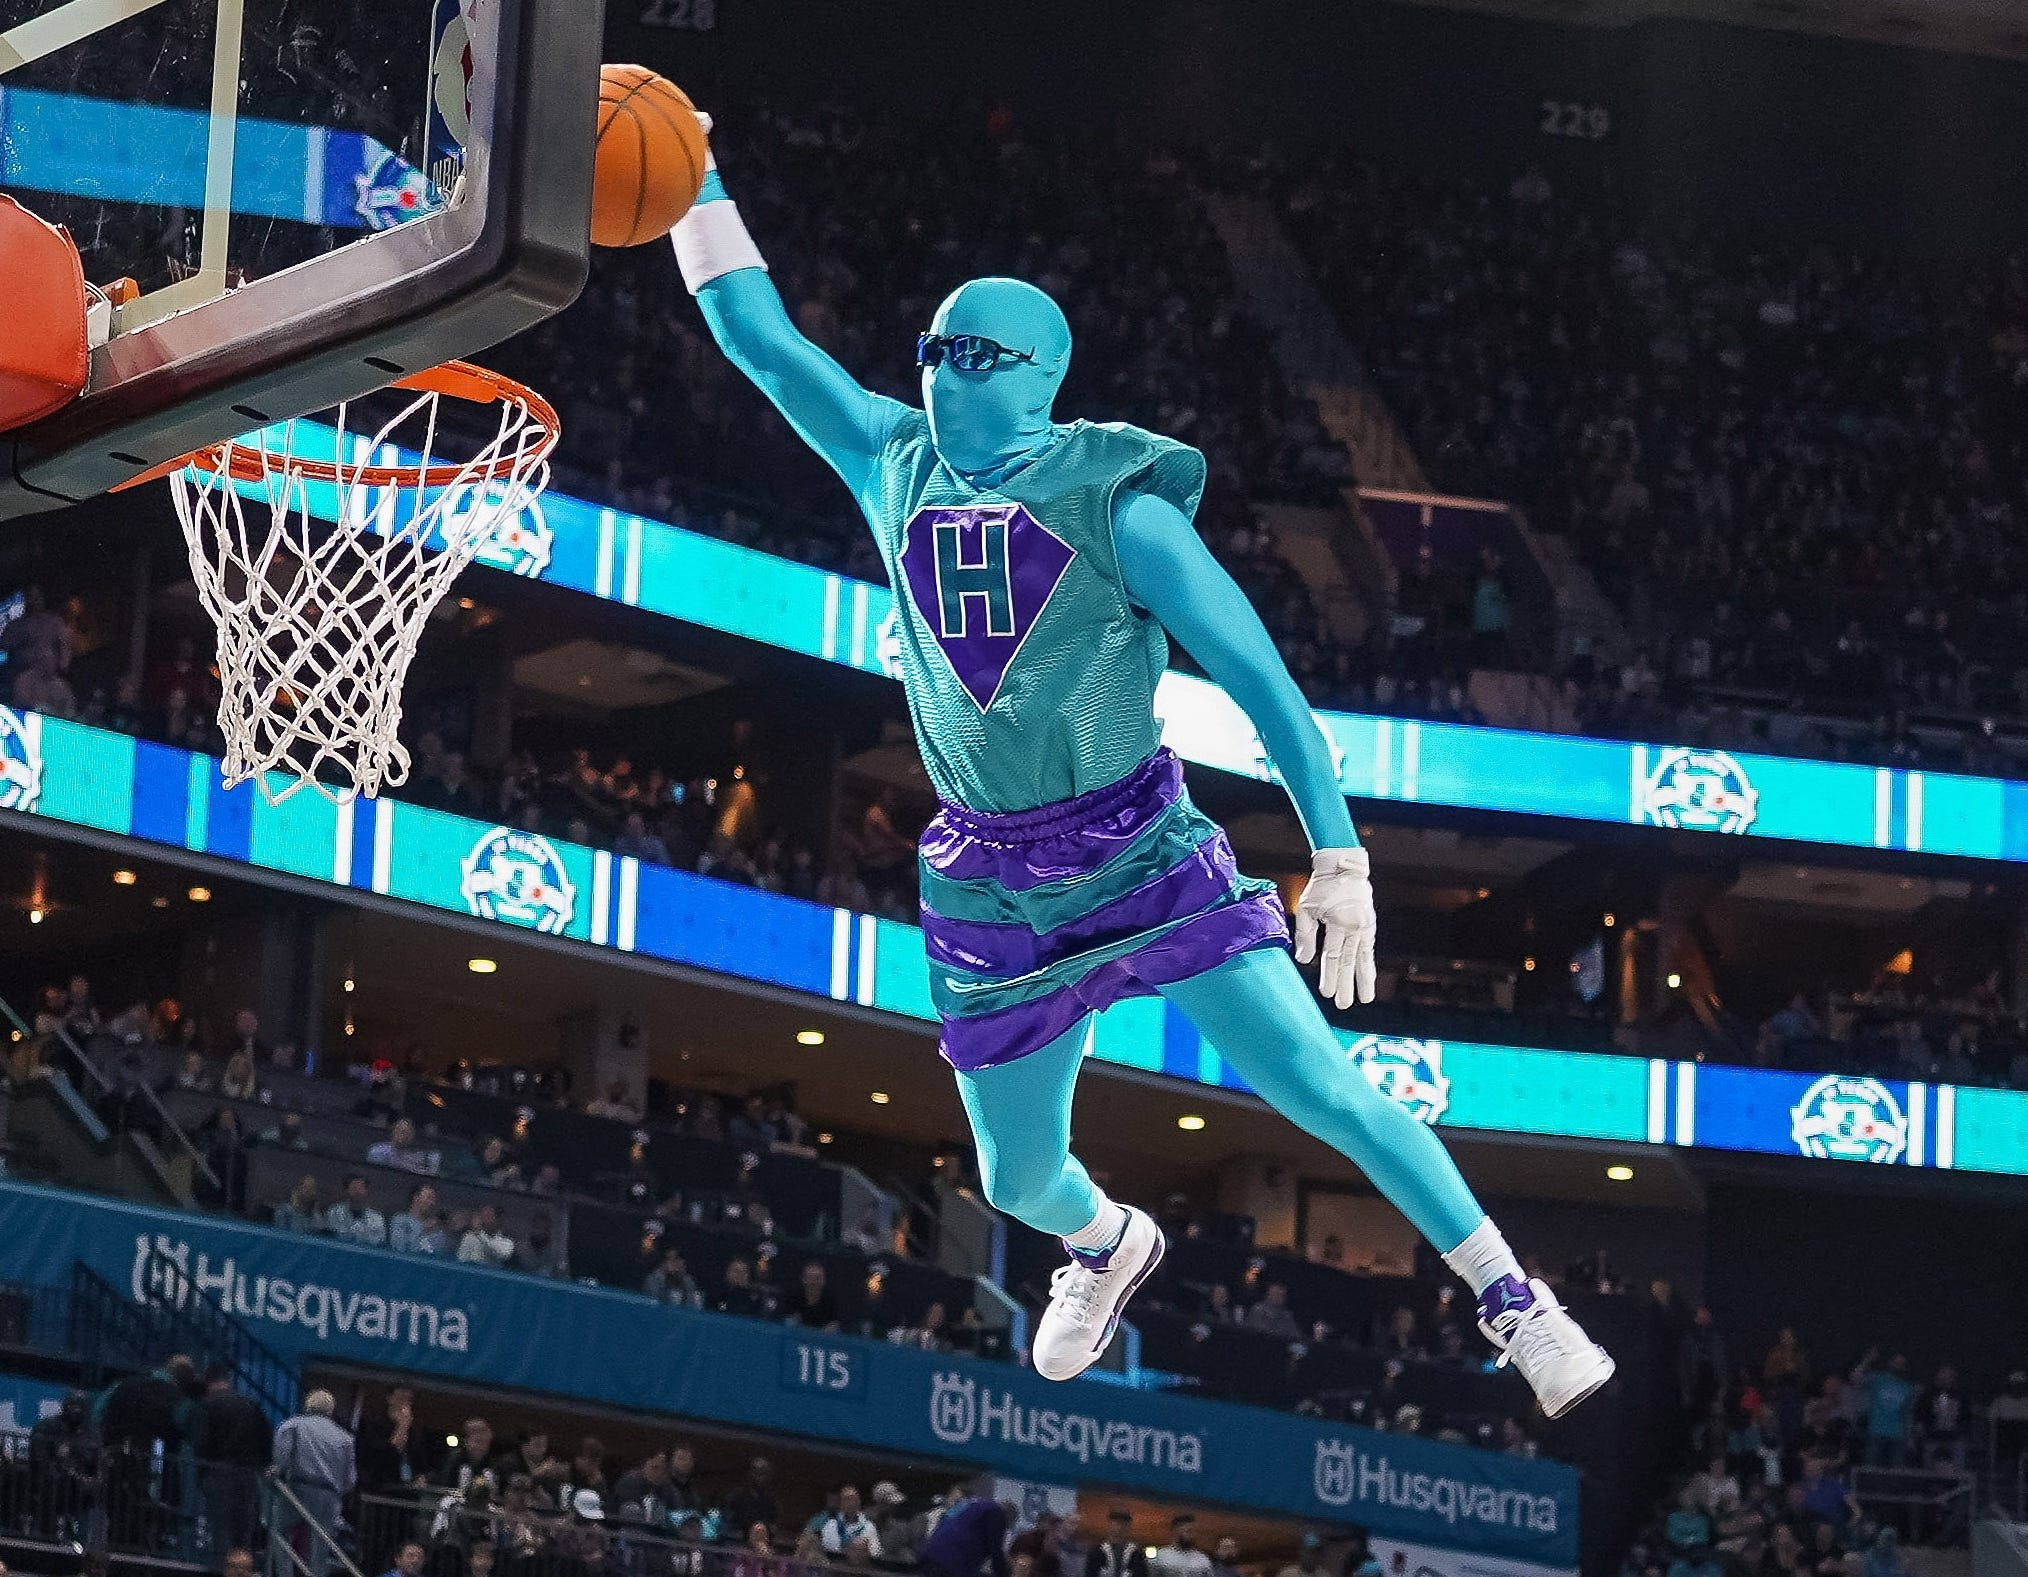 Nov. 17: Hornets mascot Super Hugo soars off a trampoline for a dunk.